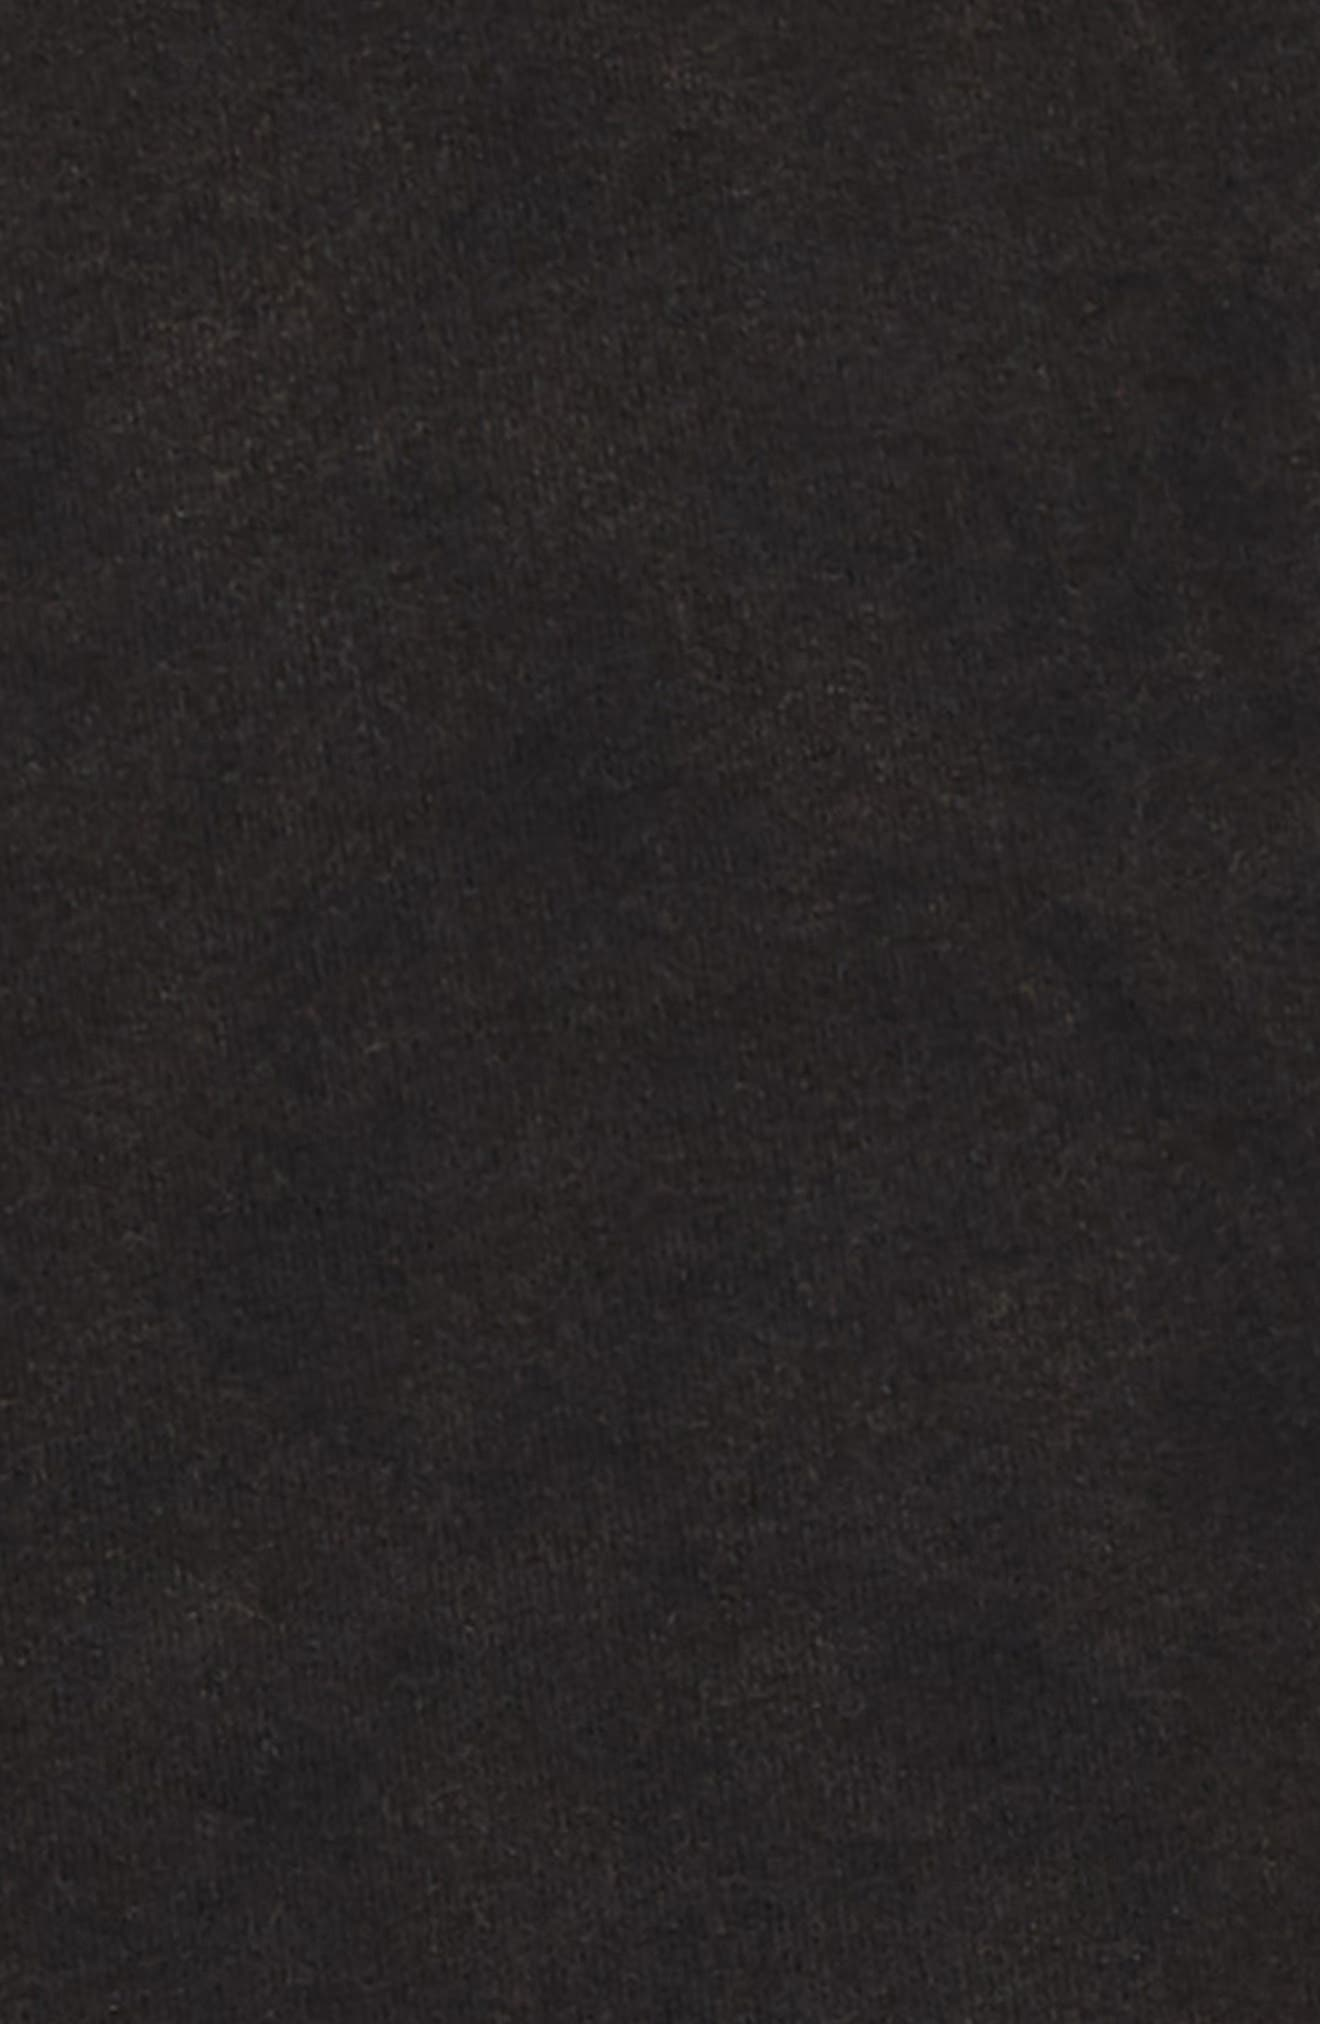 Acid Wash Track Pants,                             Alternate thumbnail 2, color,                             001